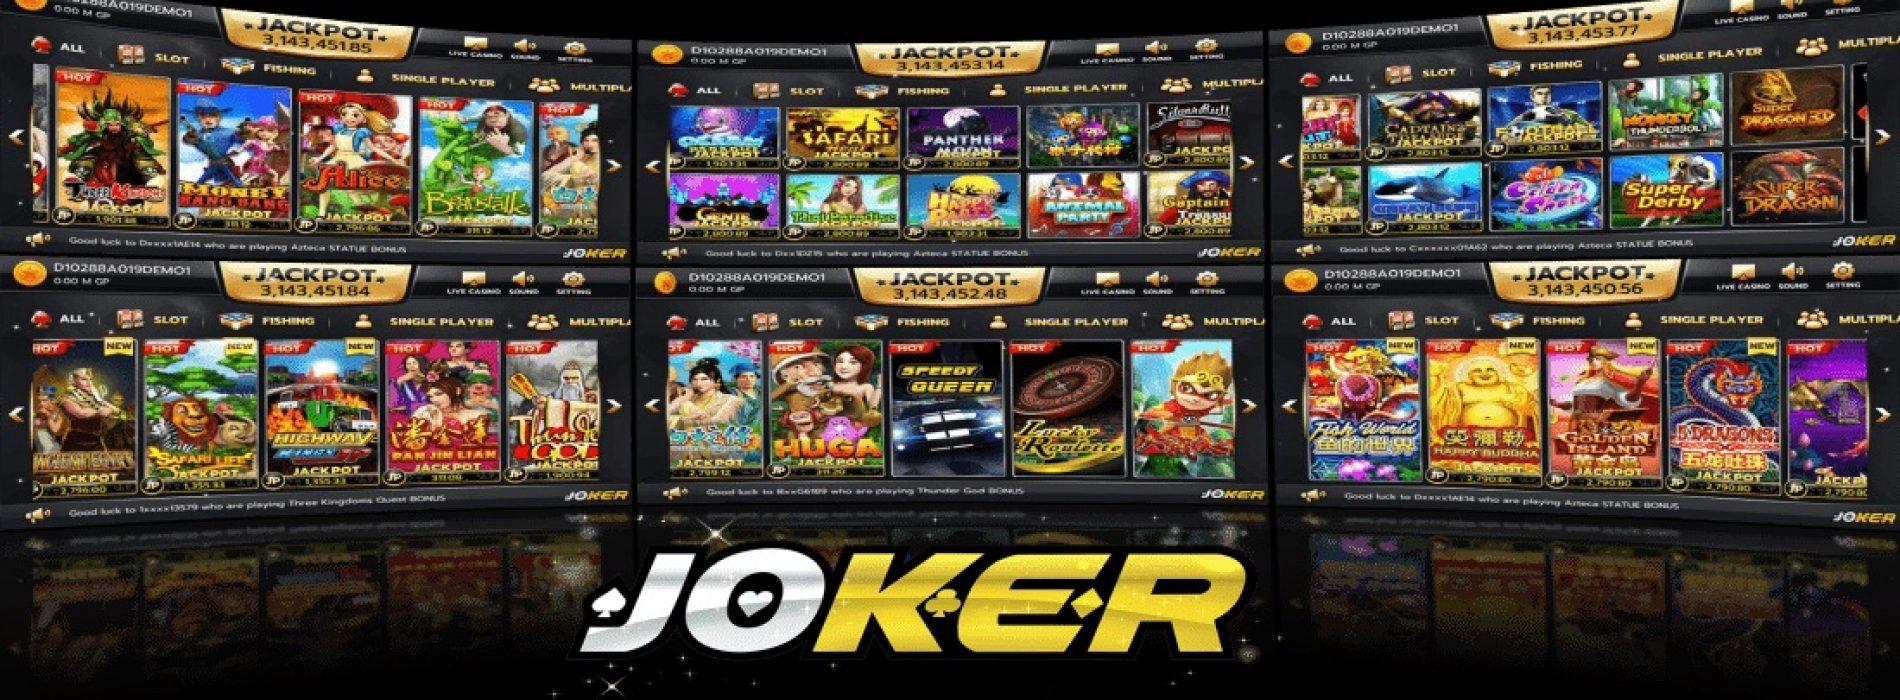 The virtual casino experience with joker123